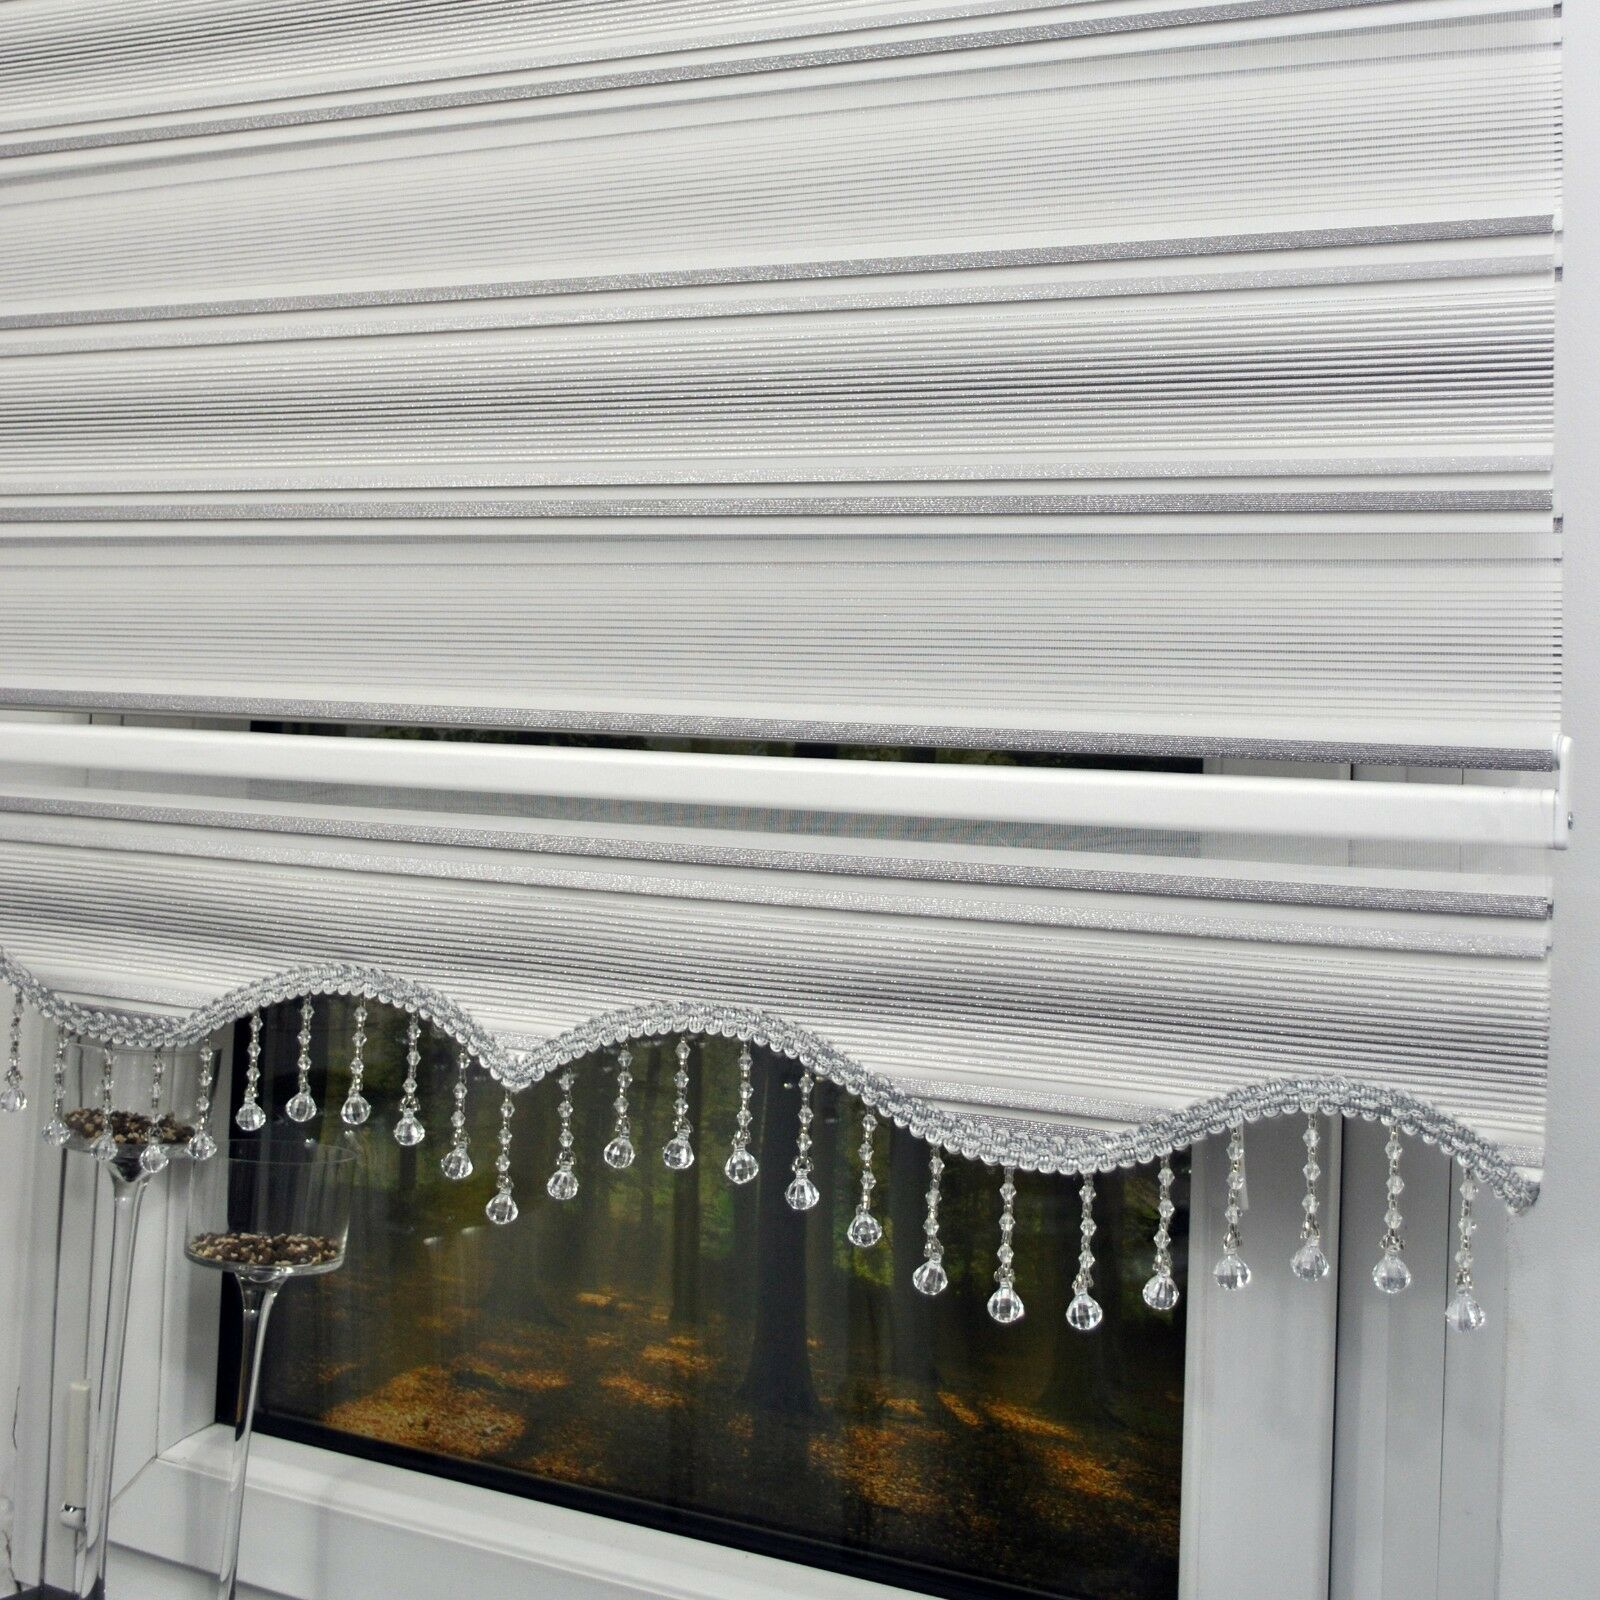 Doppelrollos White Silver Duo Roller Blind Window Zebra Perde Clamp Fix Wall Top